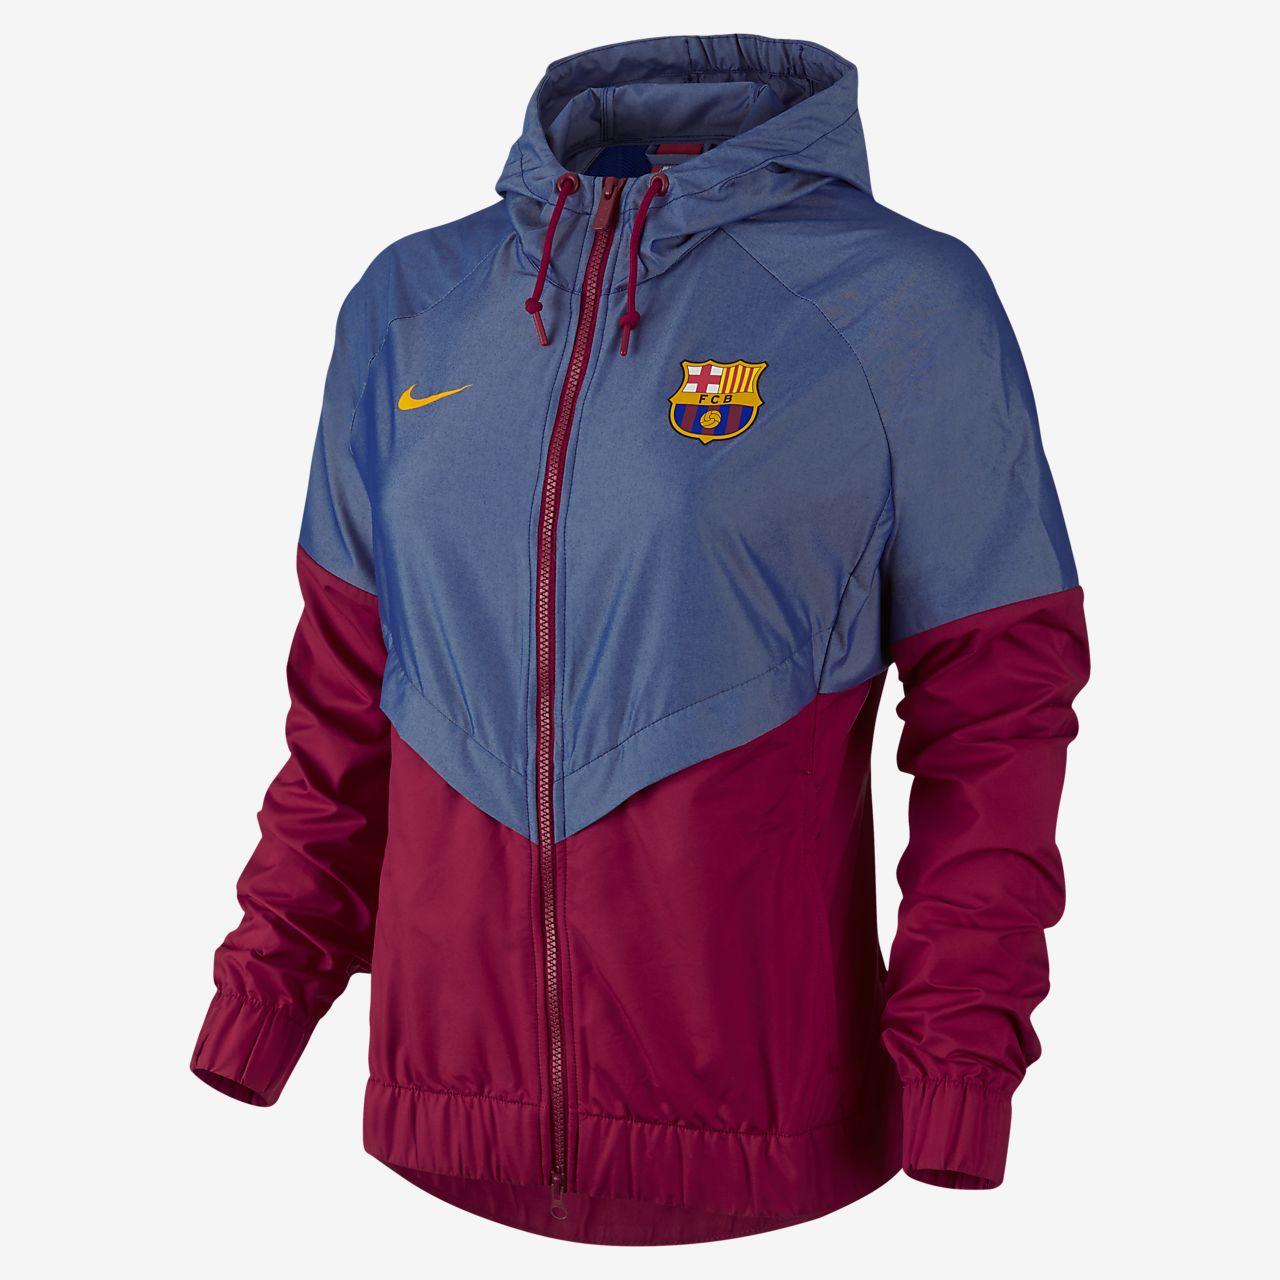 cc03b2ce608a FC Barcelona Authentic Windrunner Women s Jacket. Nike.com AE